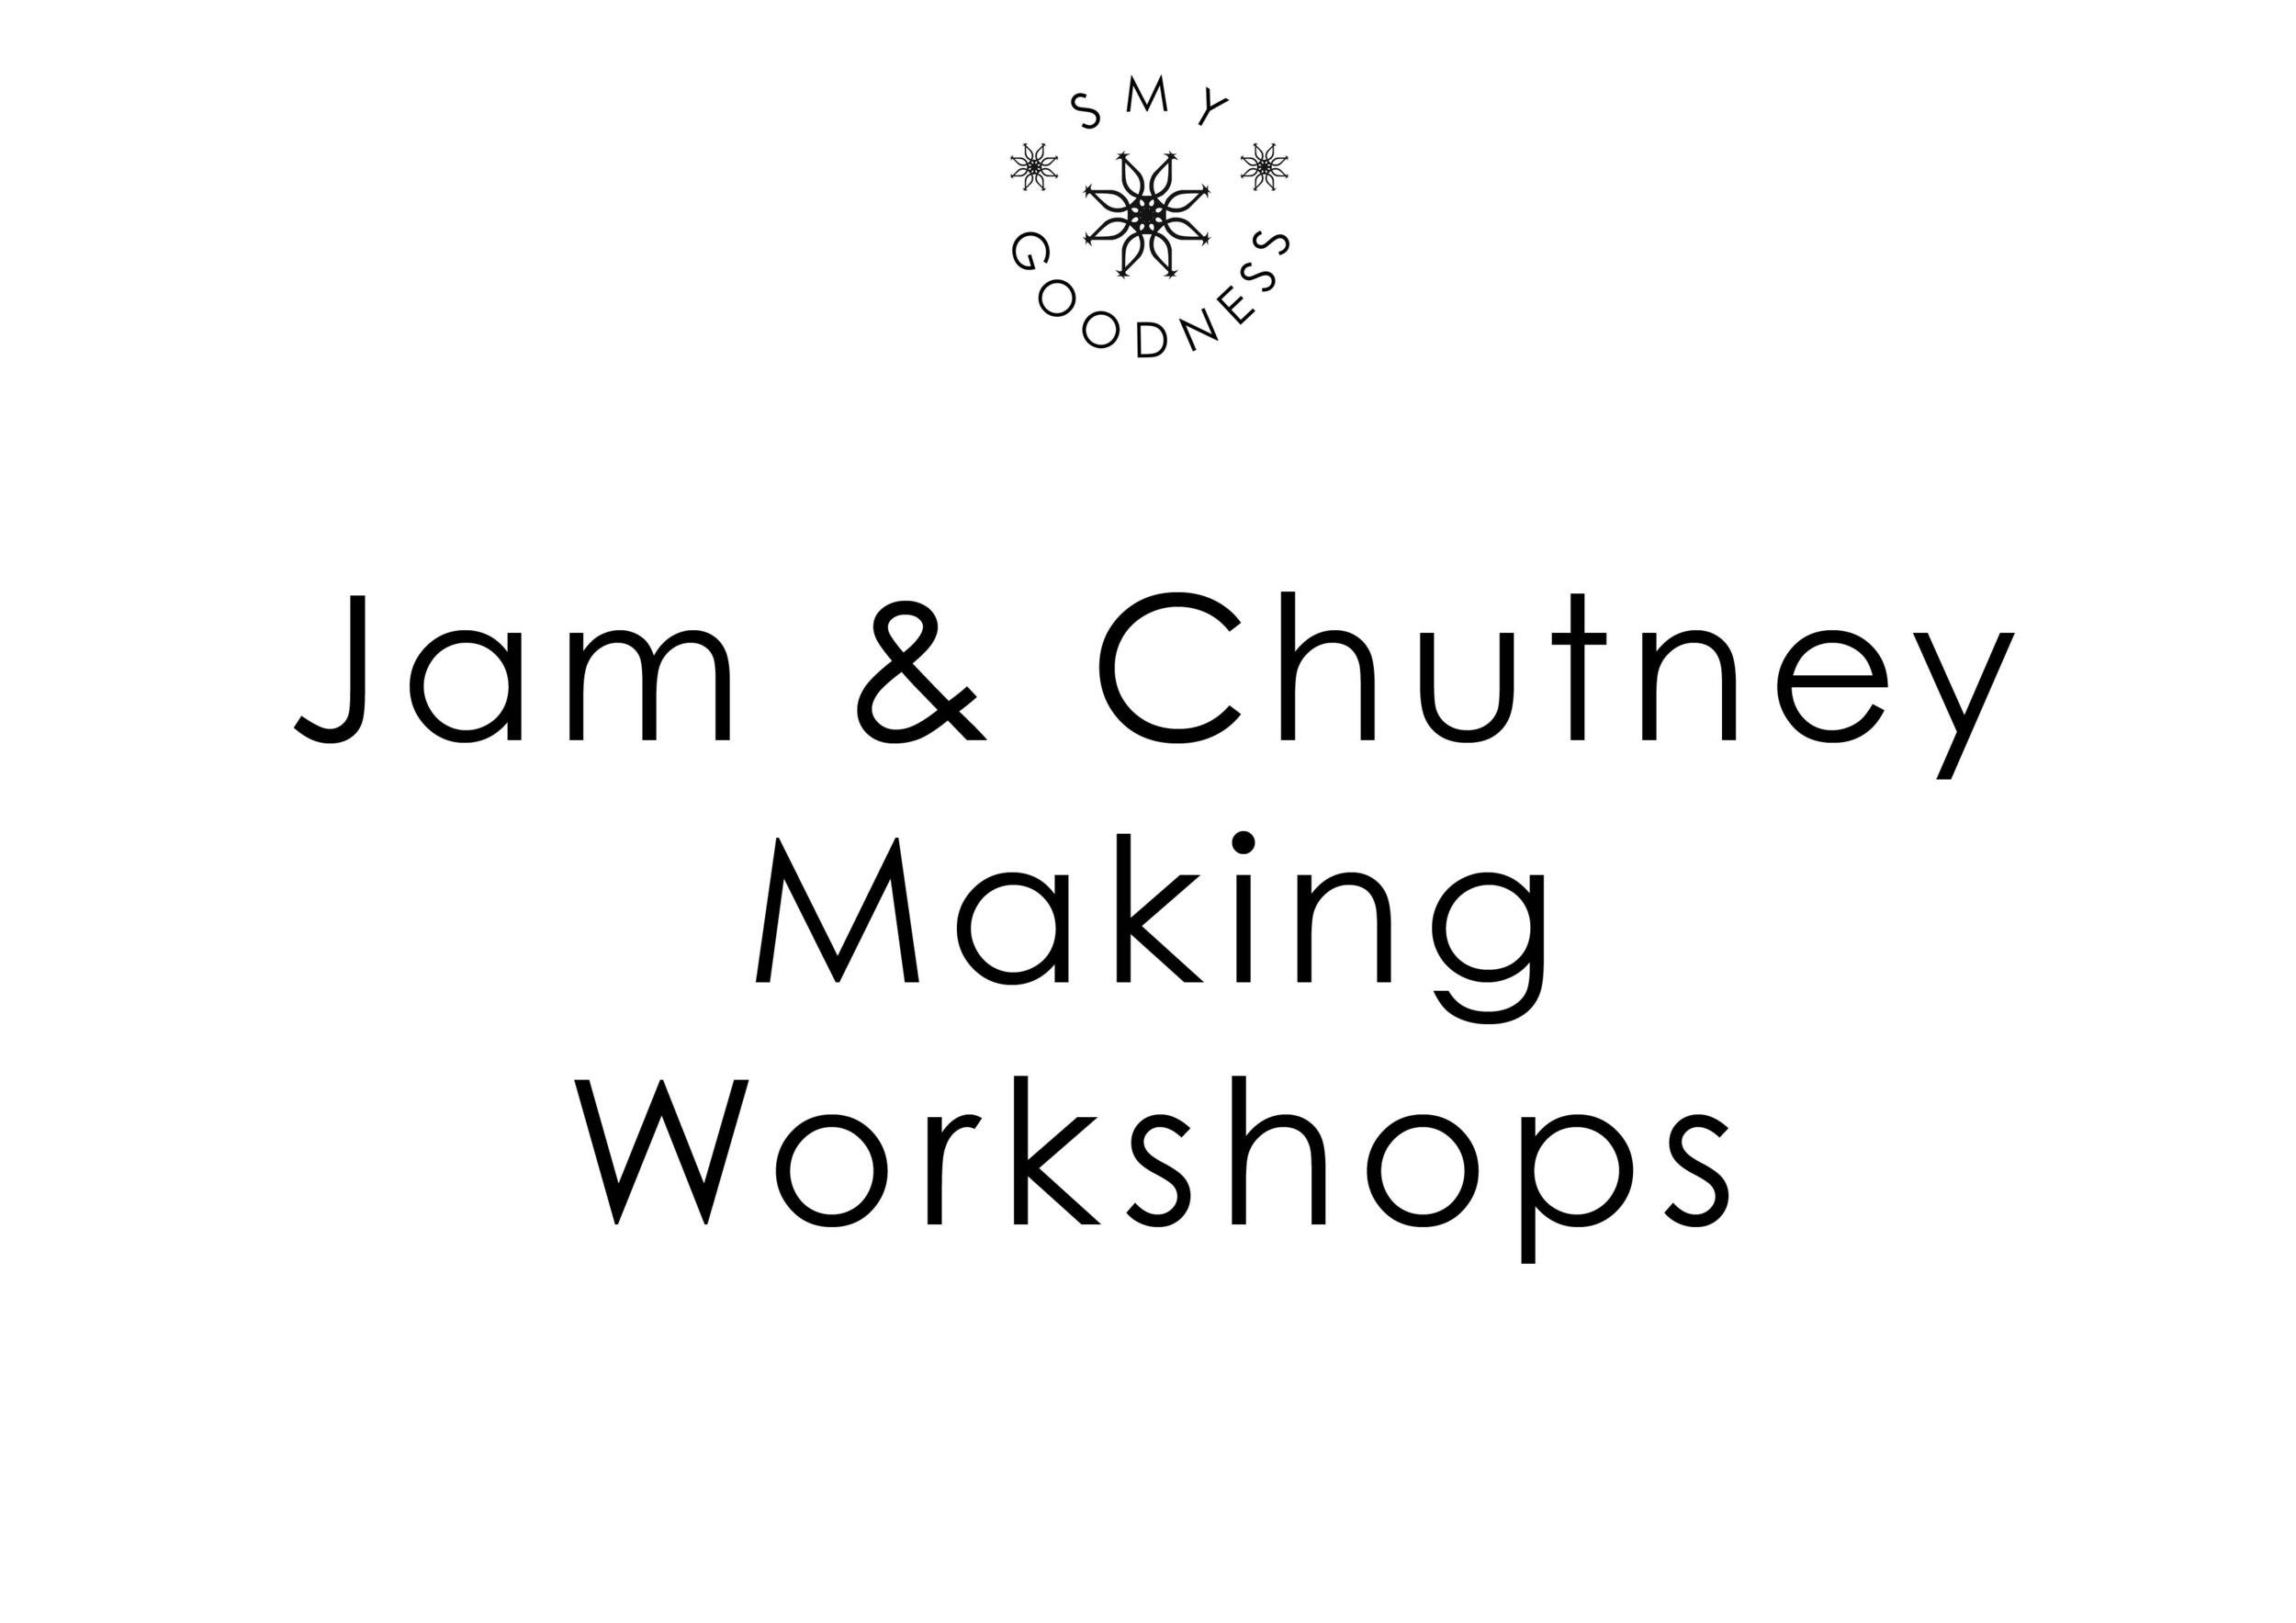 Jam & Chutney Making Workshops